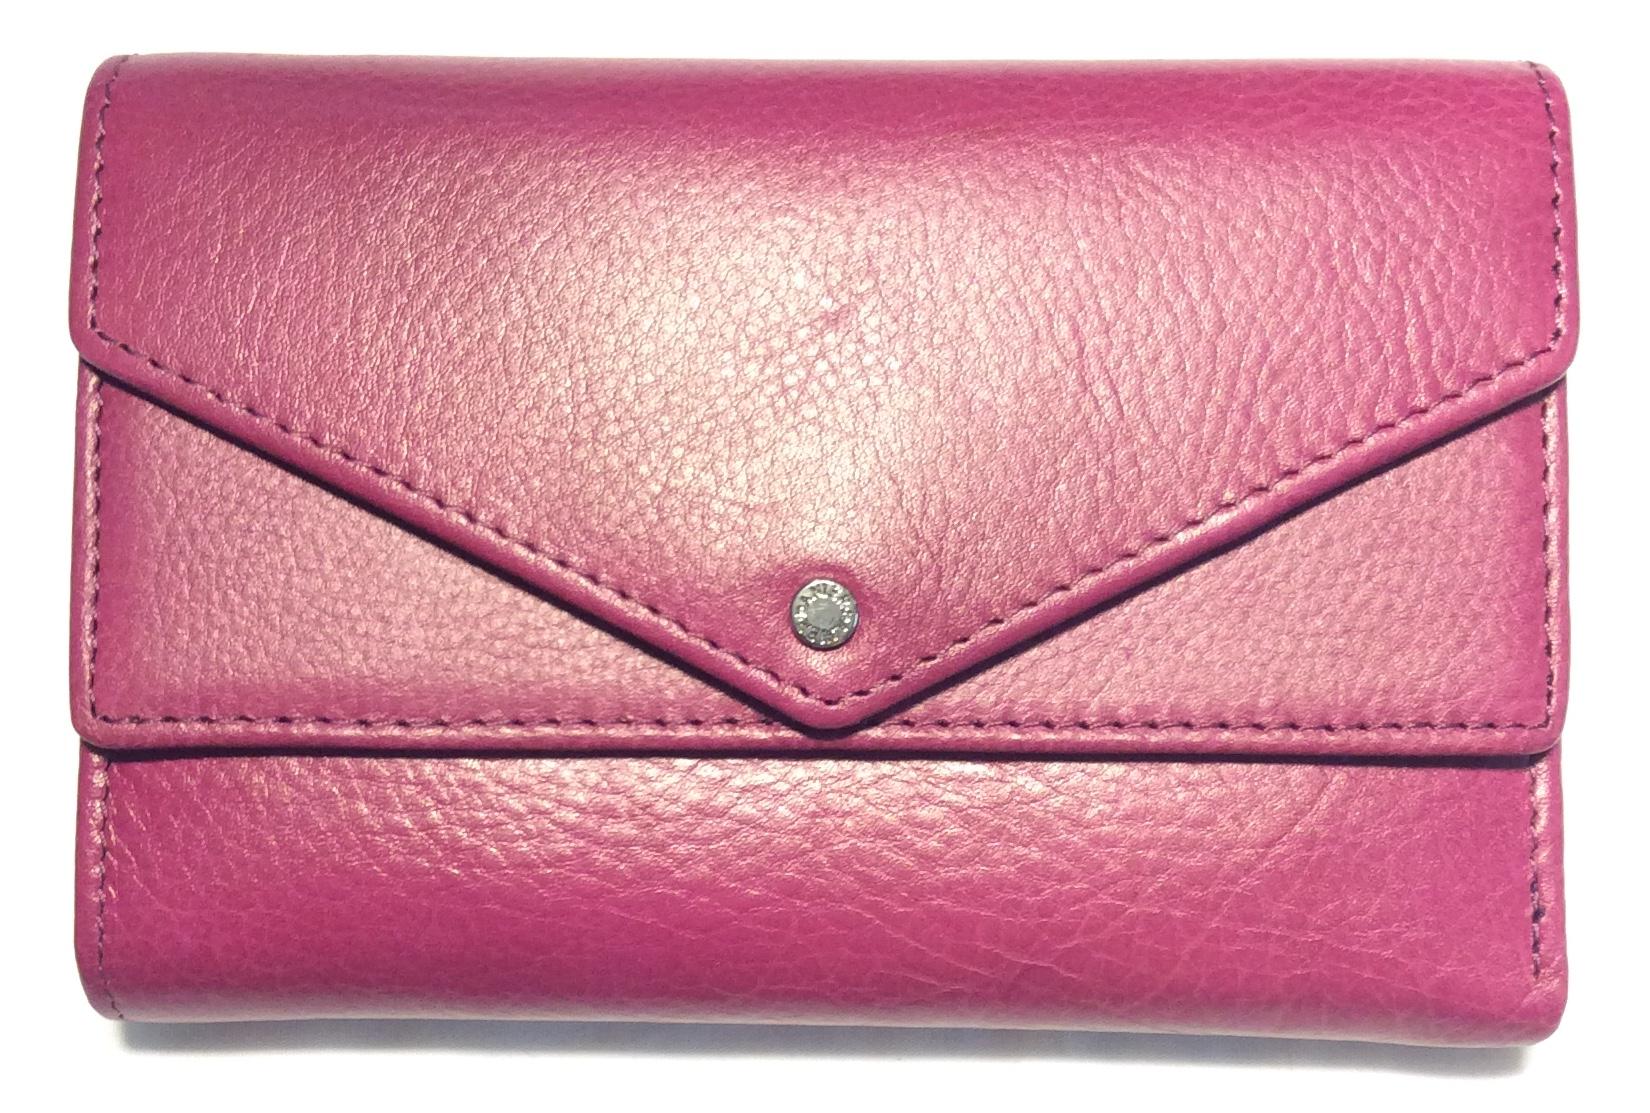 Danier Magenta leather wallet